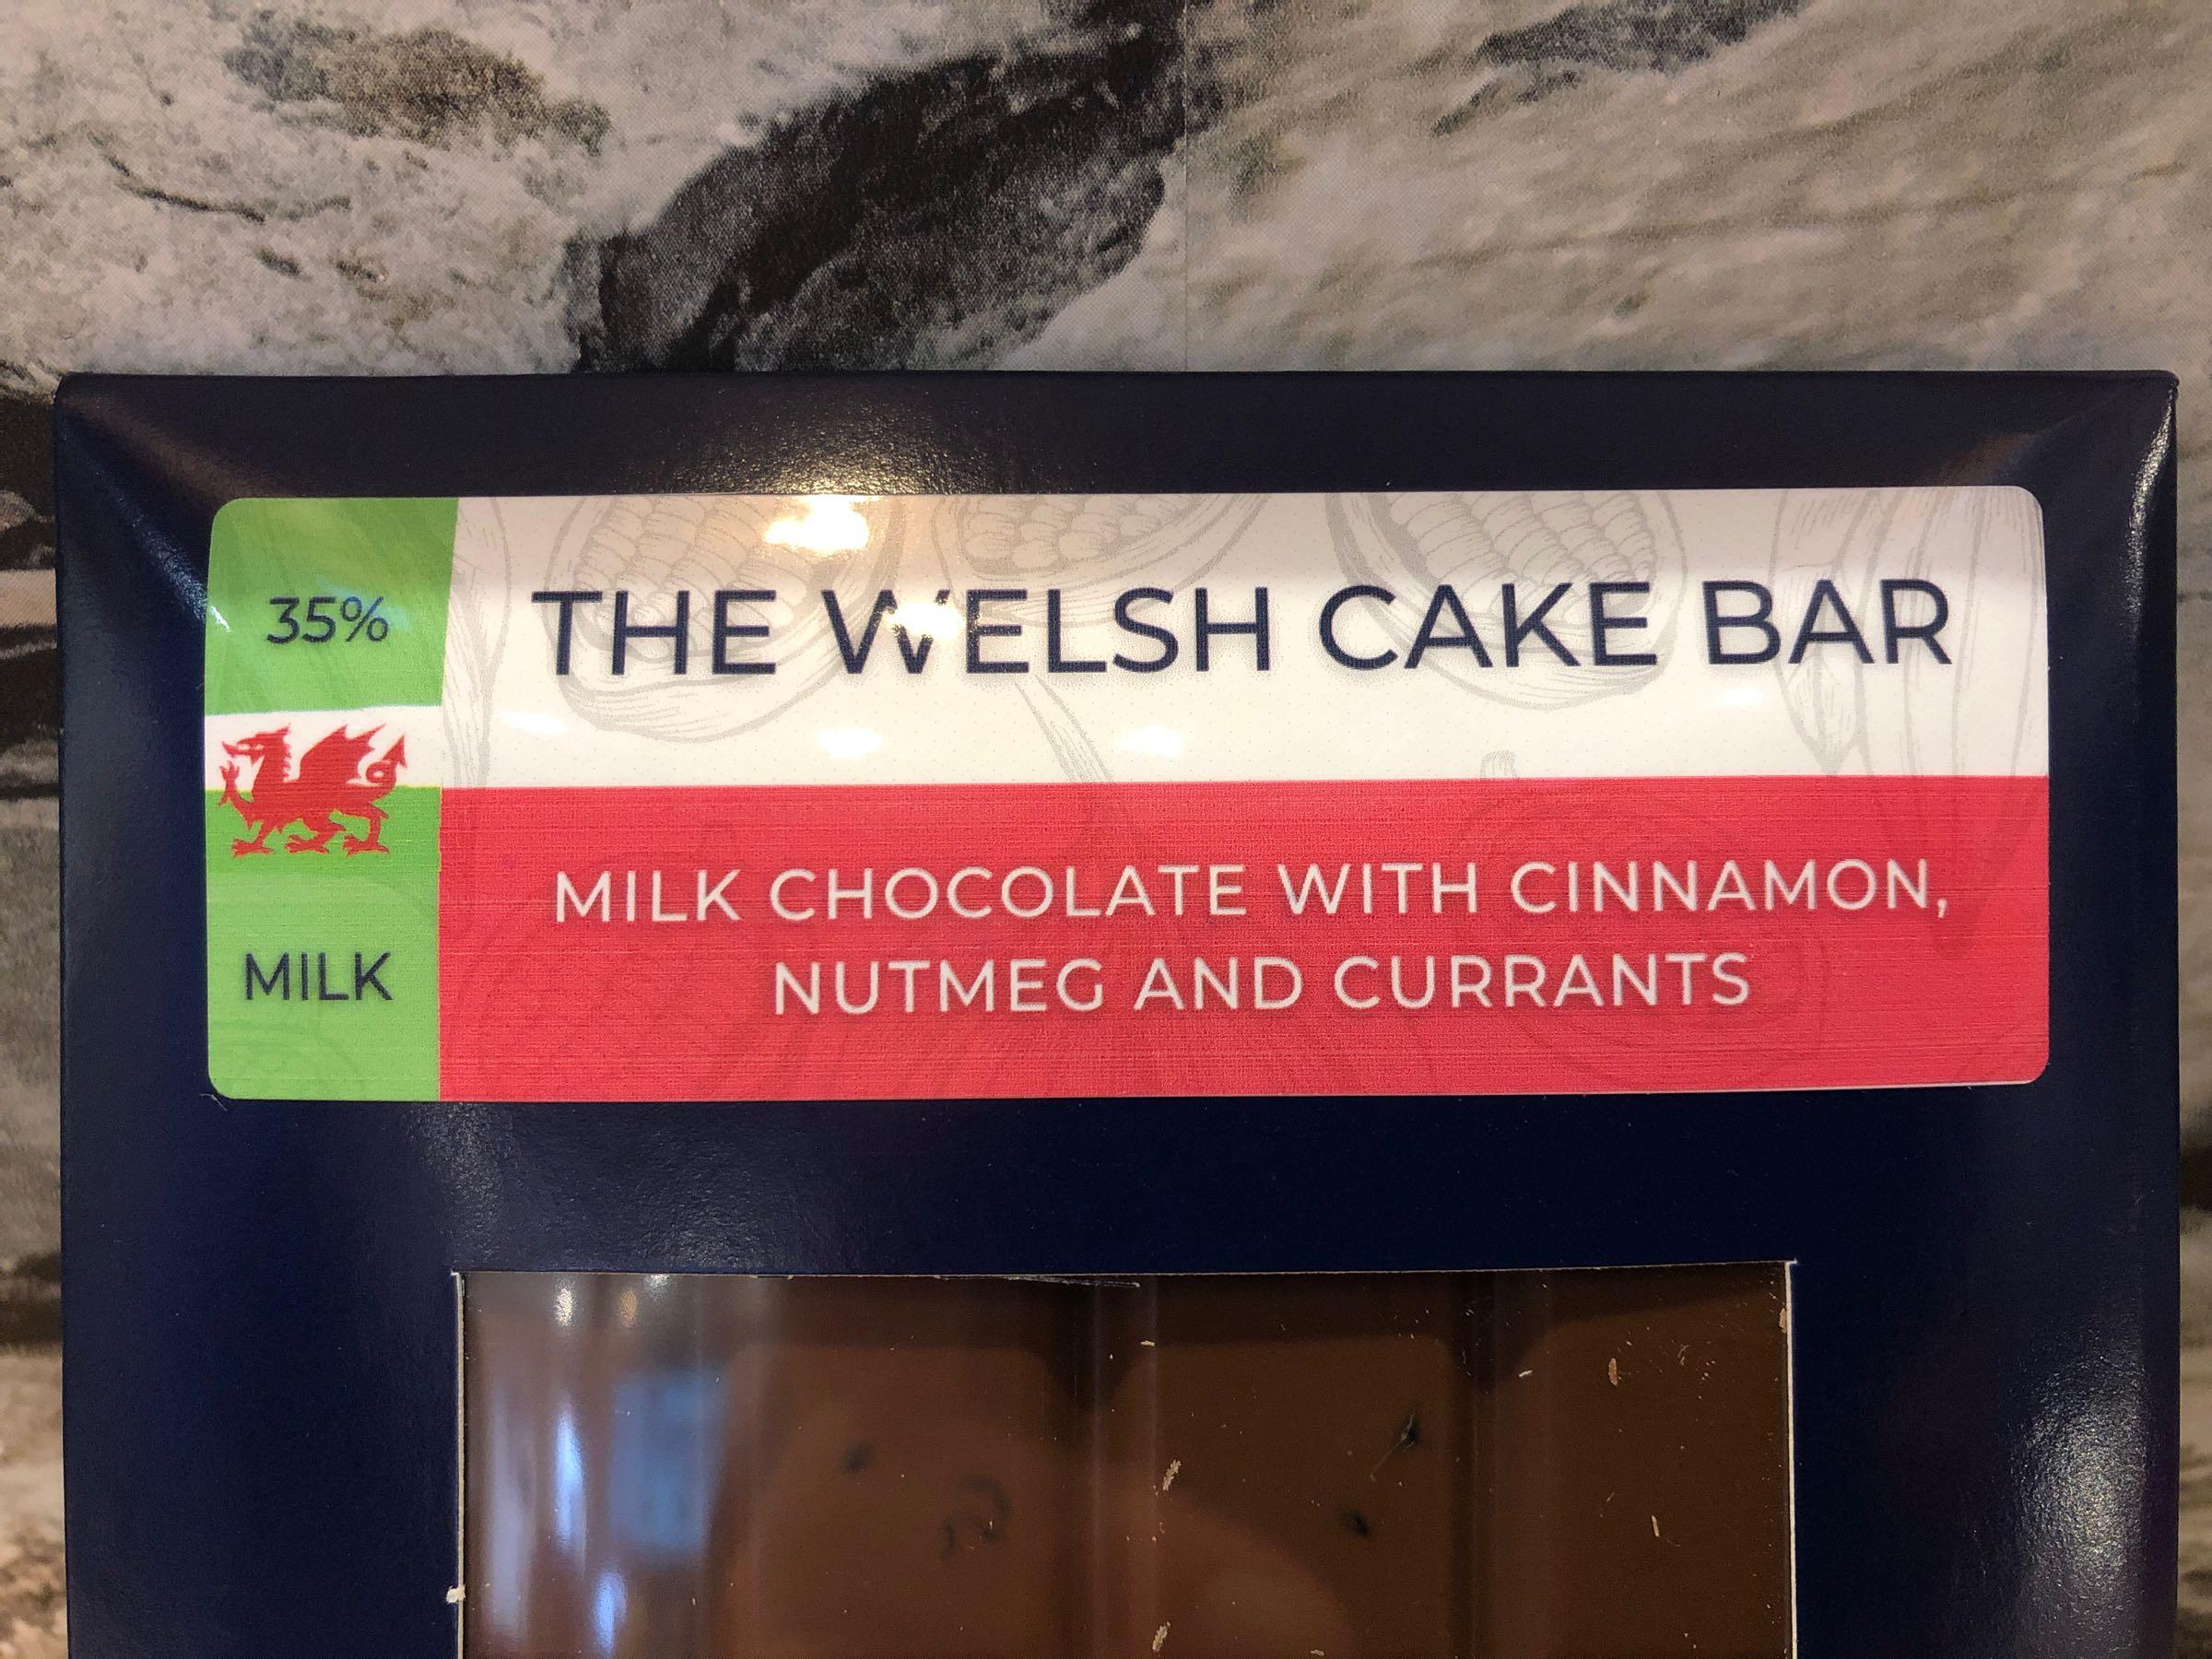 The Welsh Cake Bar.